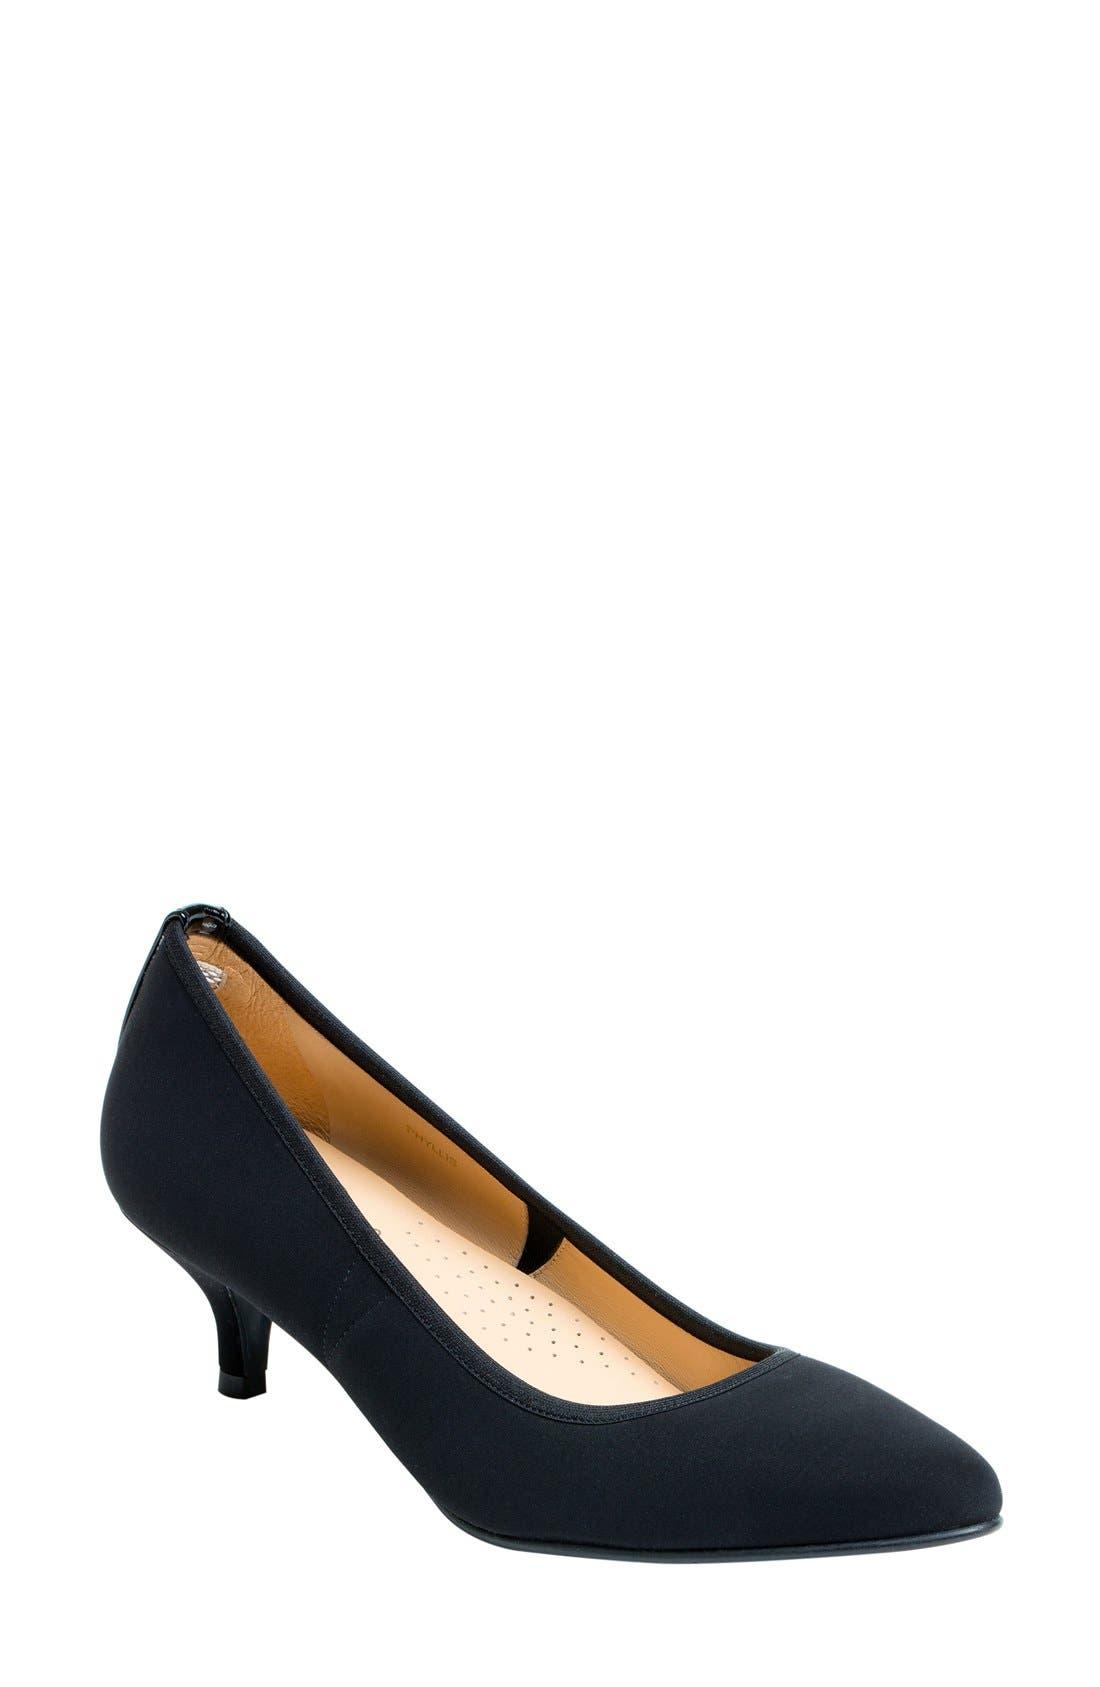 Phyllis Kitten Heel Pump,                         Main,                         color, Black Fabric